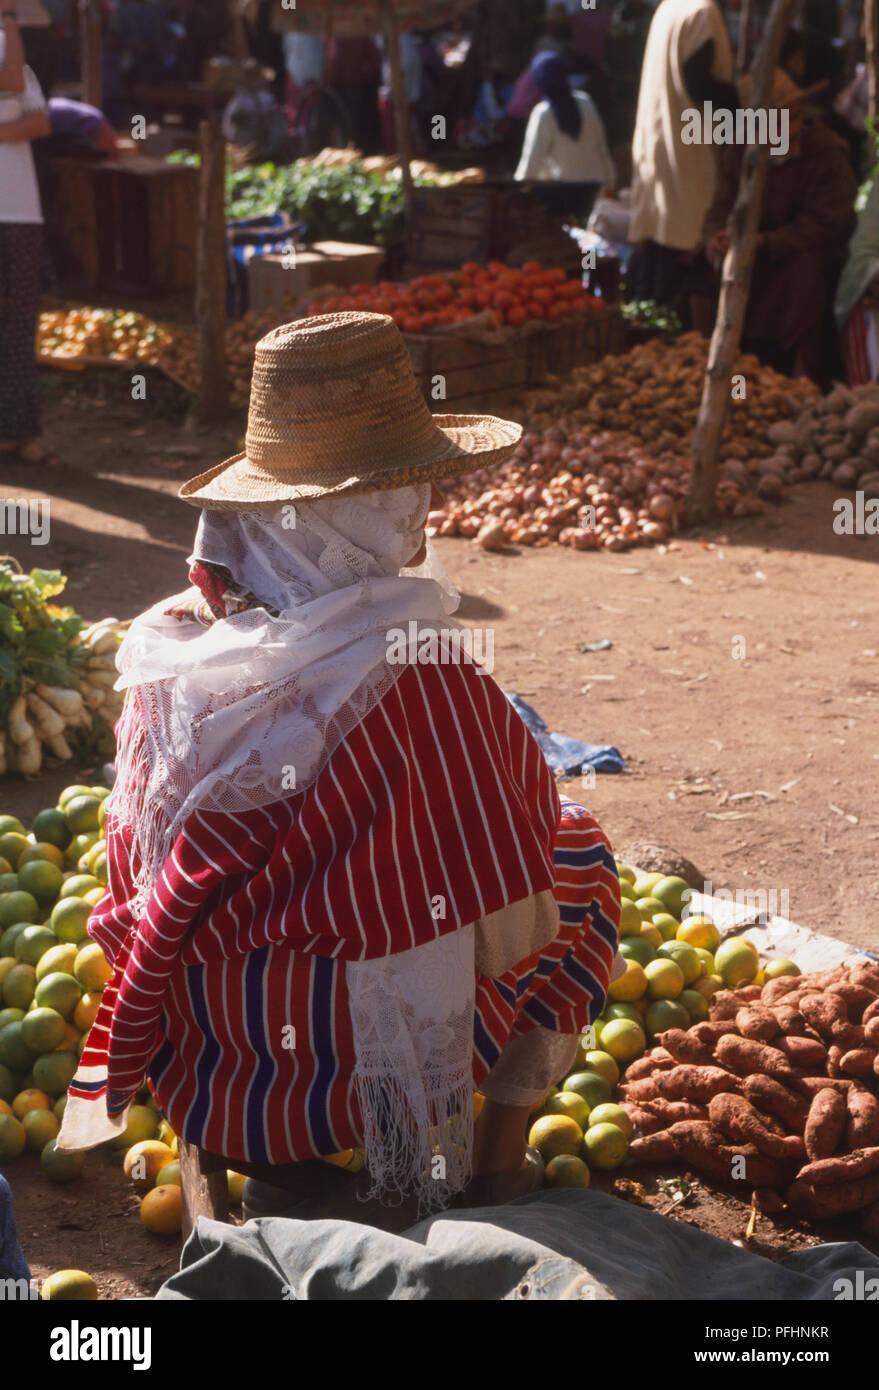 Conical Straw Hats Imágenes De Stock   Conical Straw Hats Fotos De ... 91ad1b21ad0